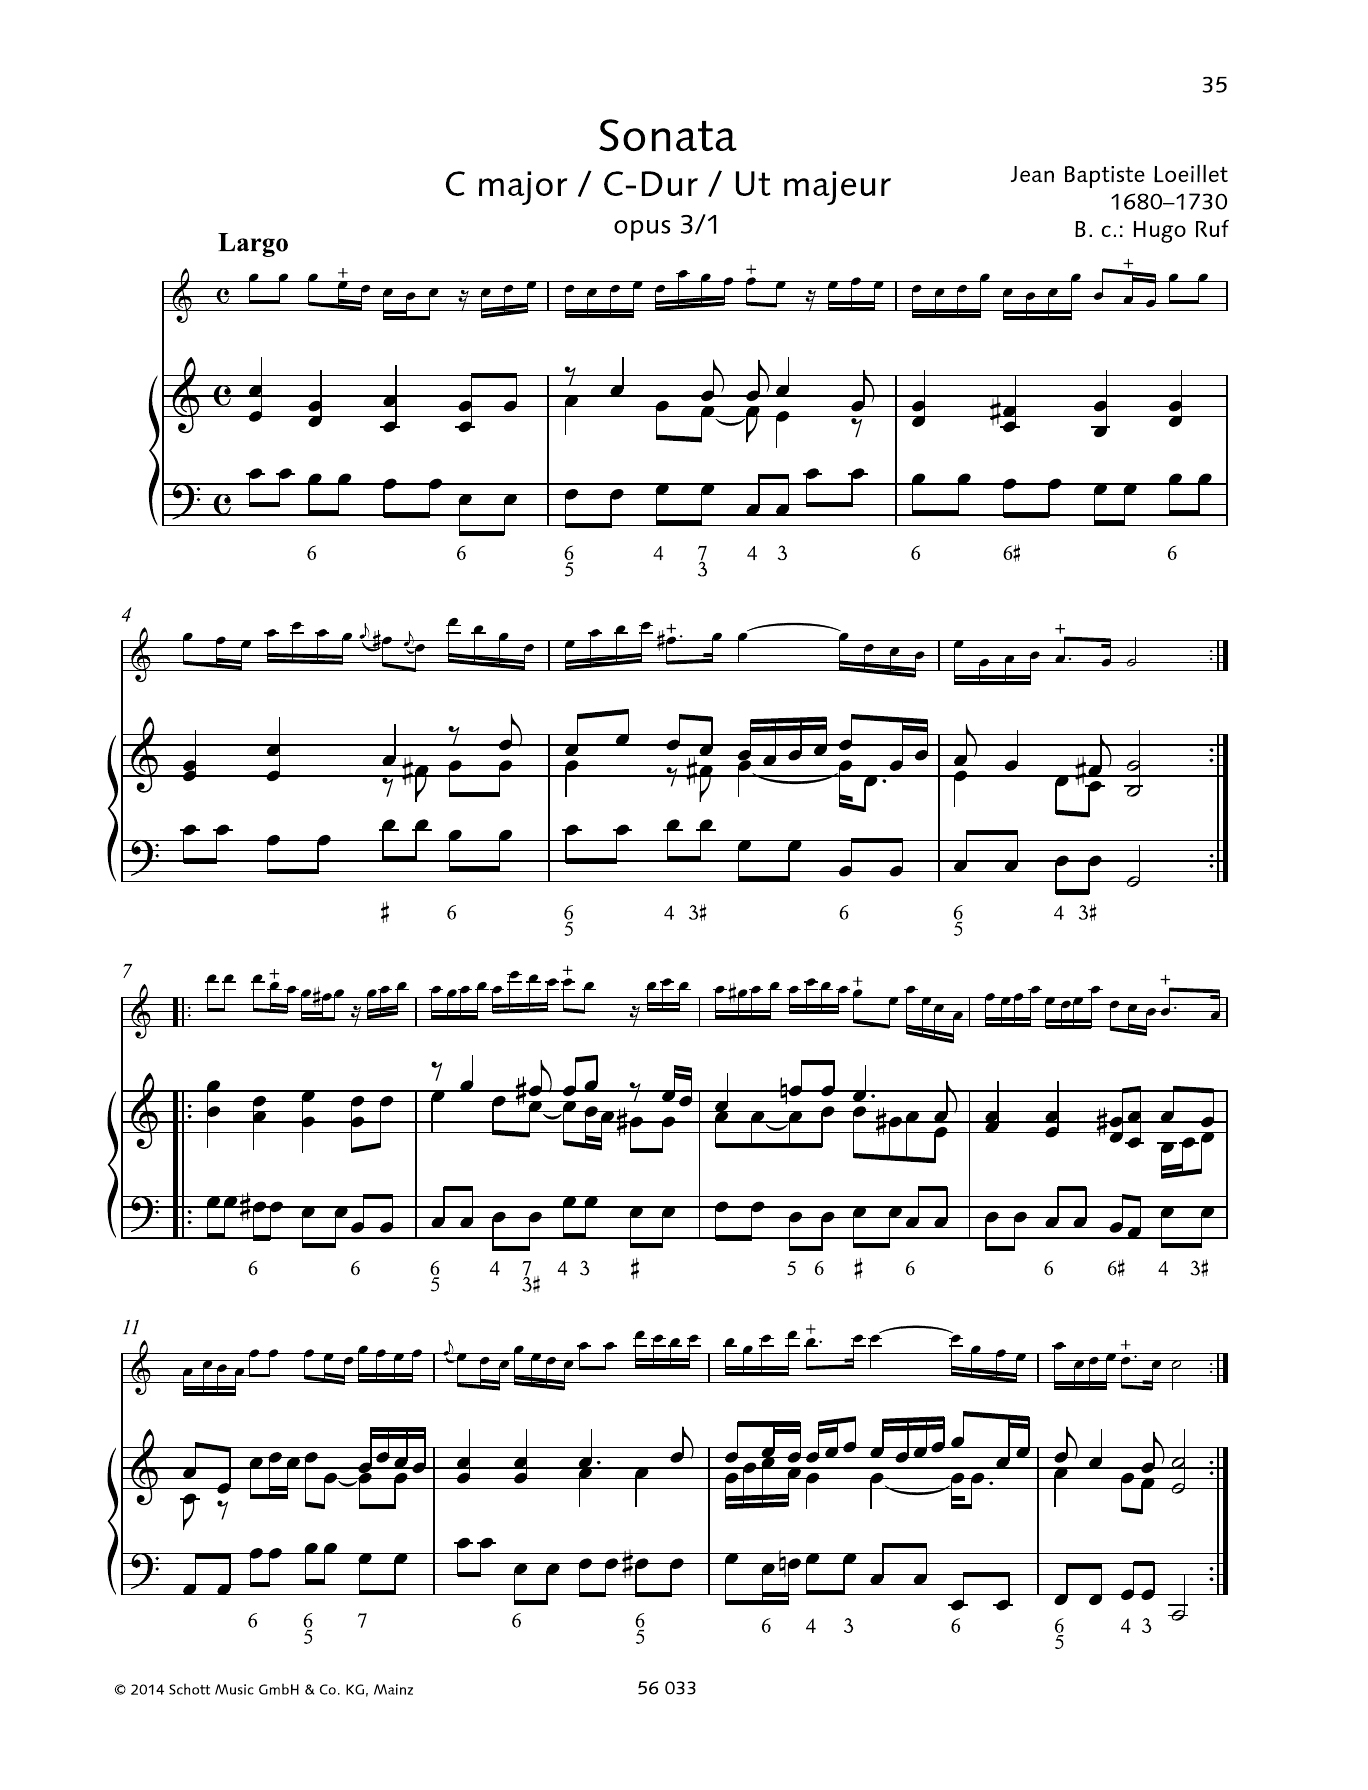 Sonata C Major Sheet Music